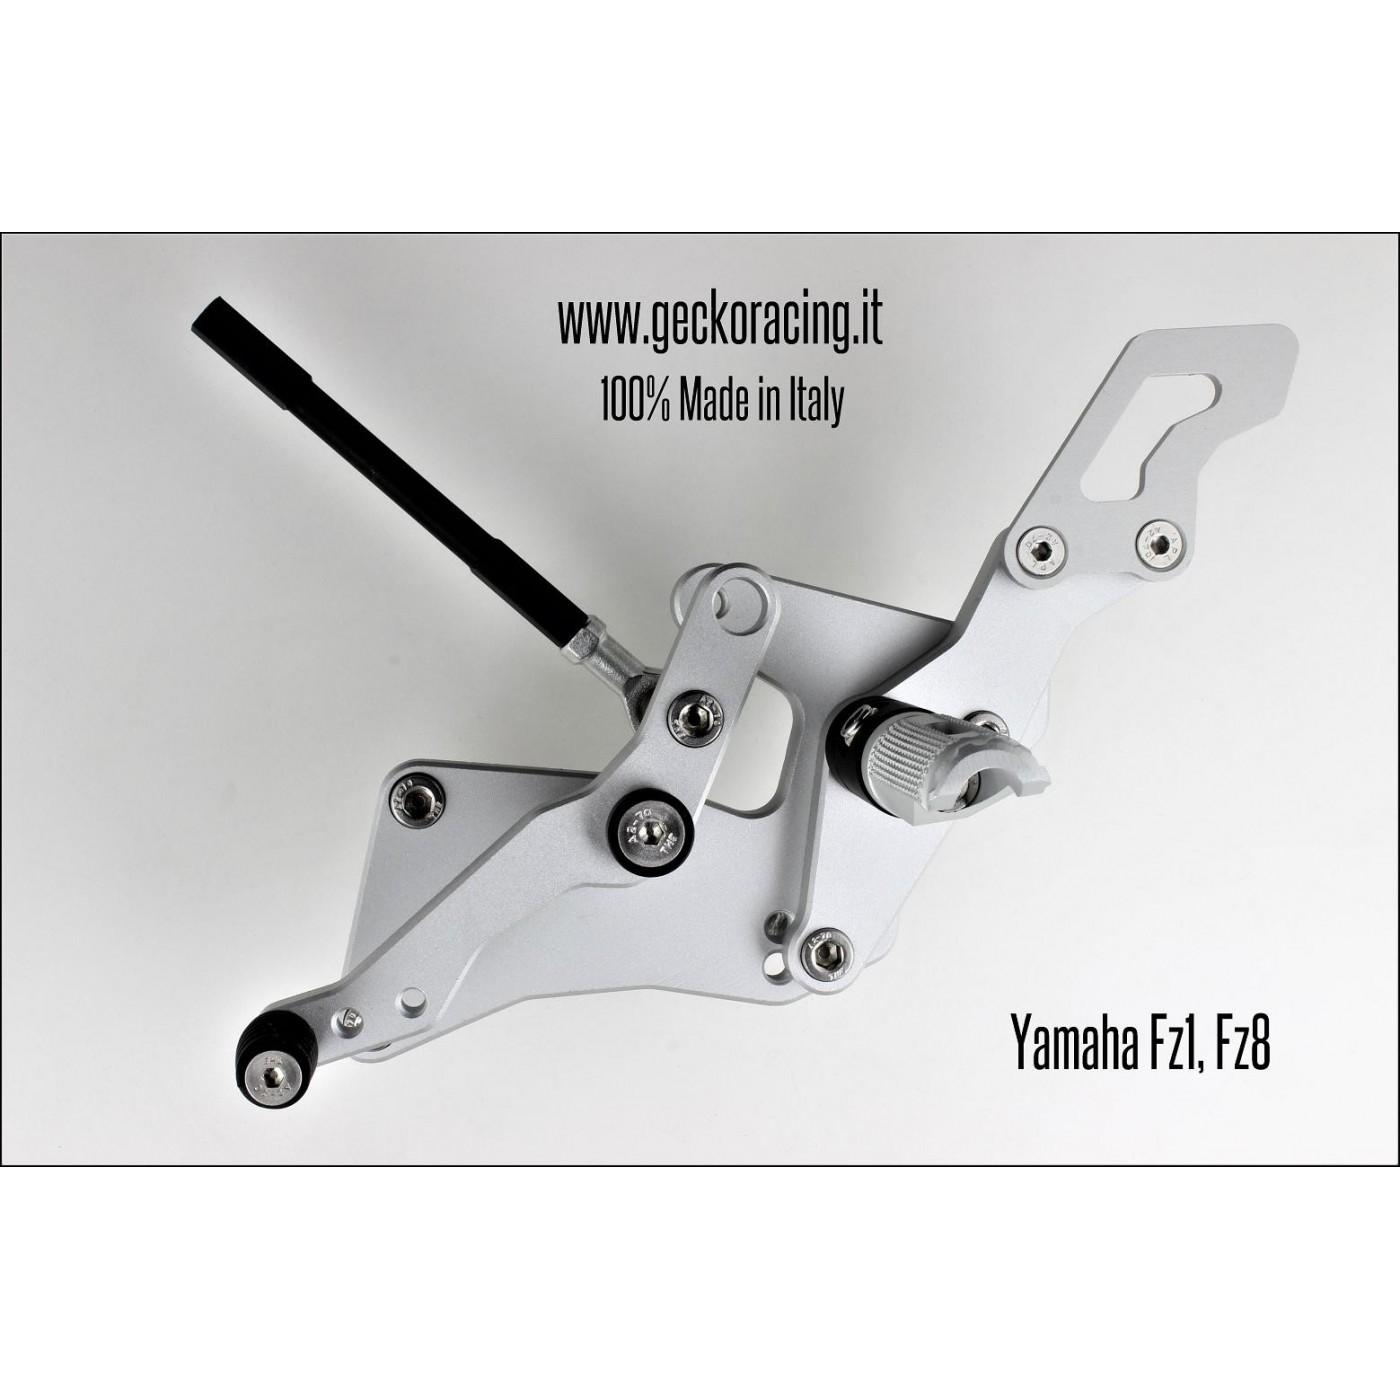 Rearsets Adjustable Yamaha Fz1, Fz8 Gear